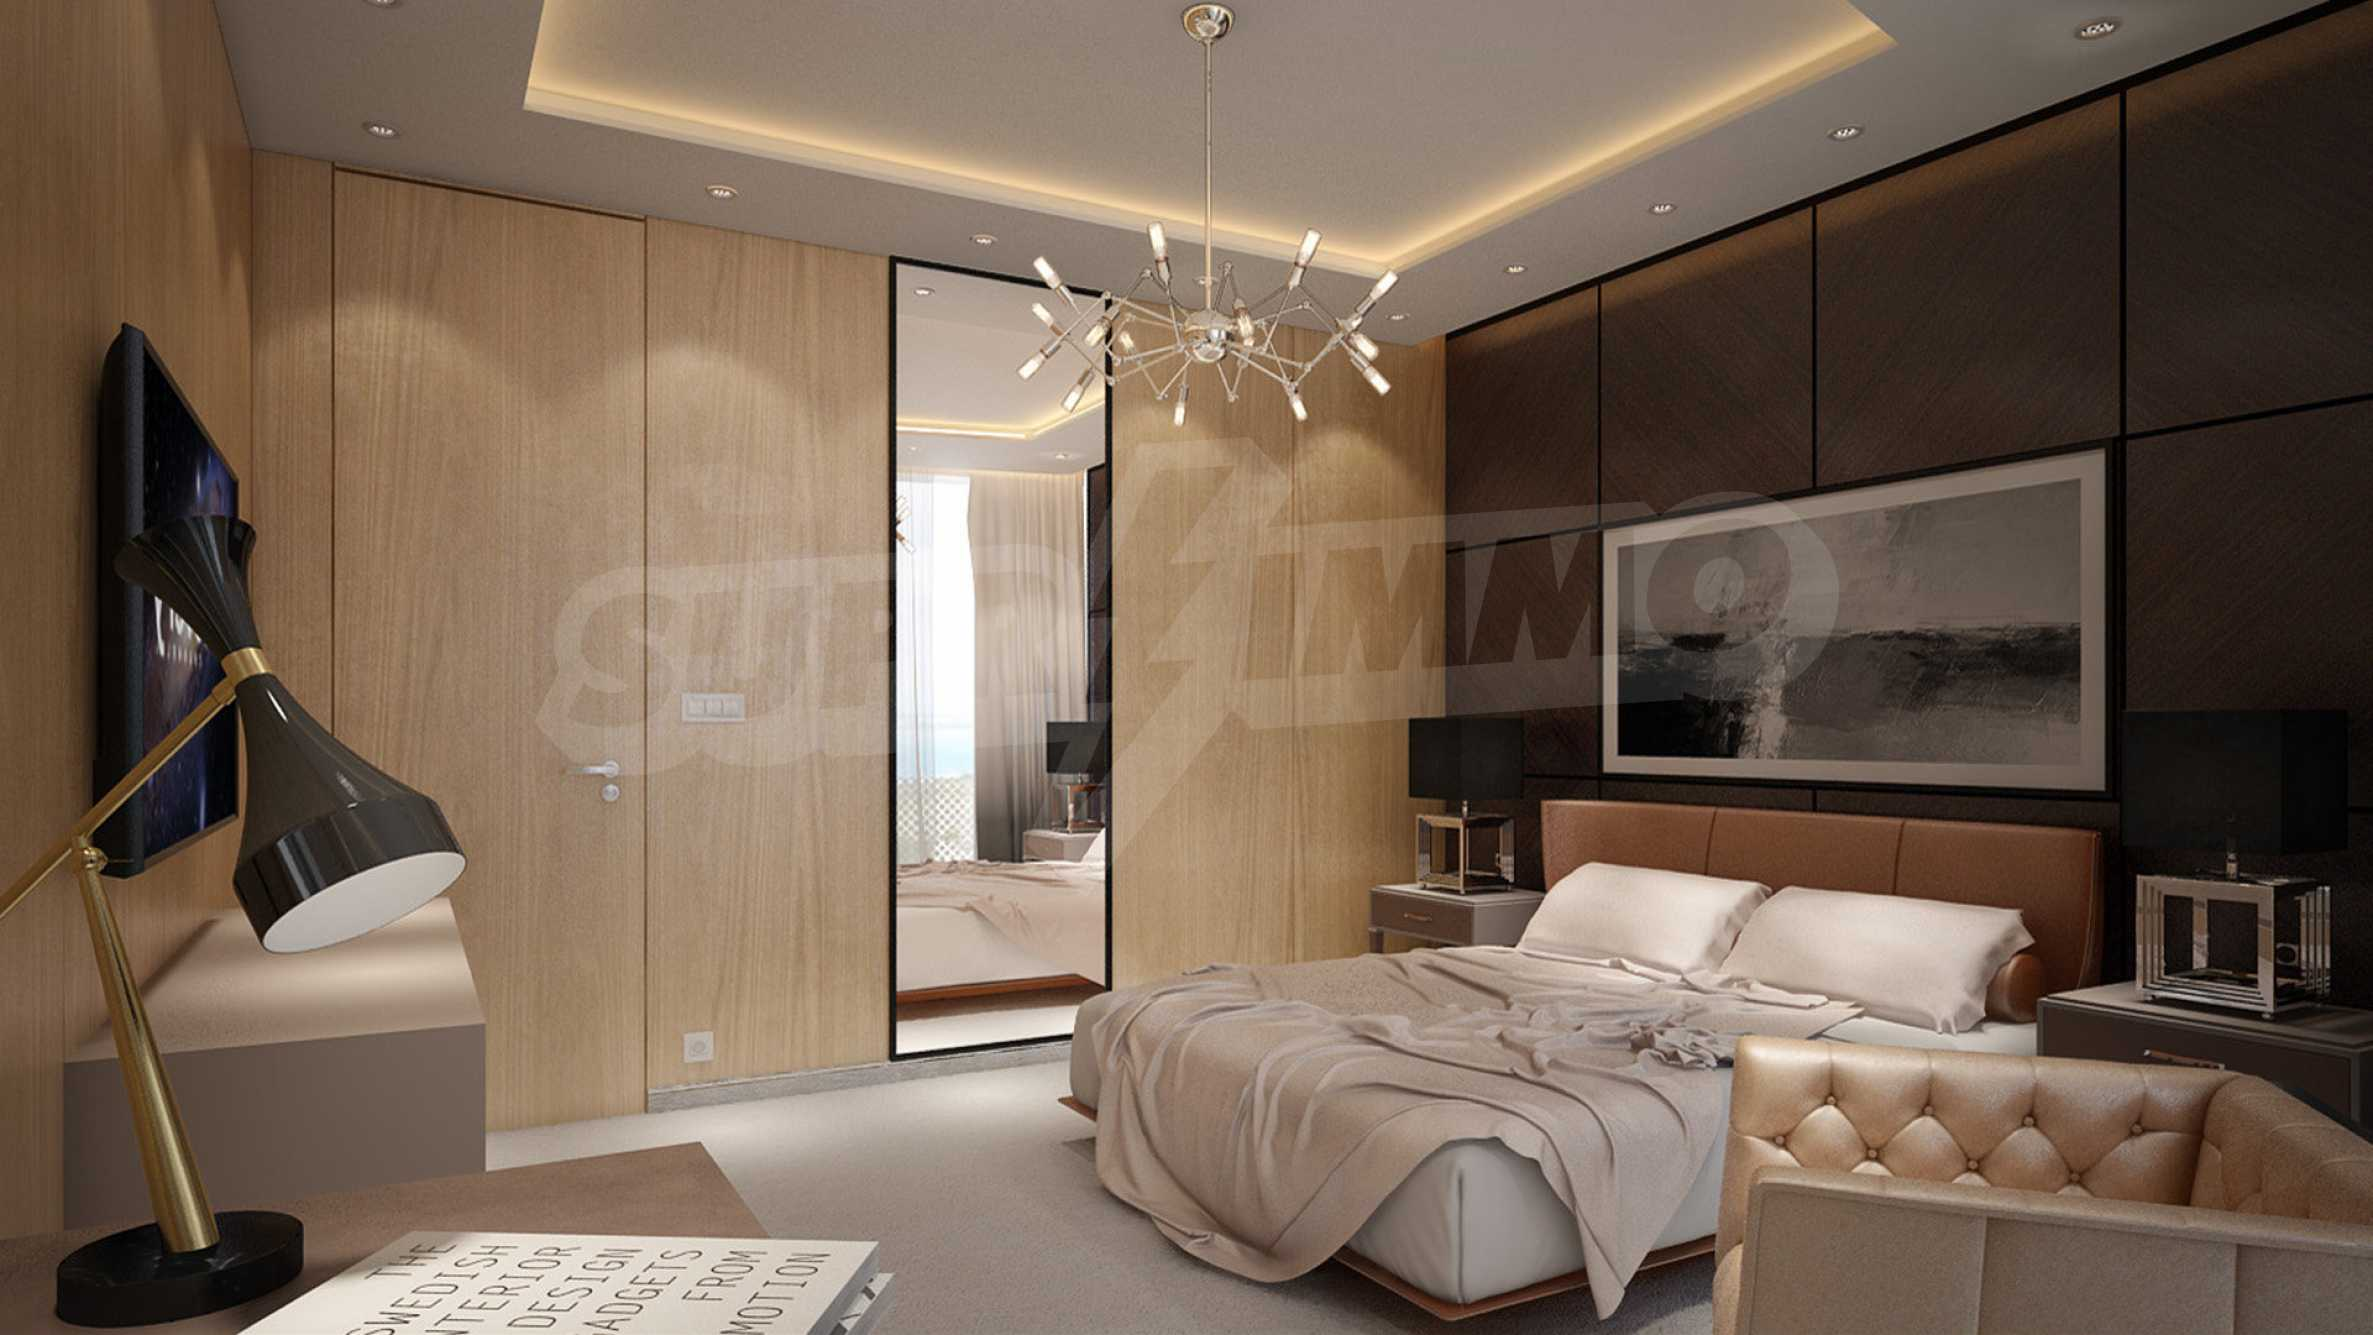 Нова сграда с луксозни апартаменти в гр. Бургас 58